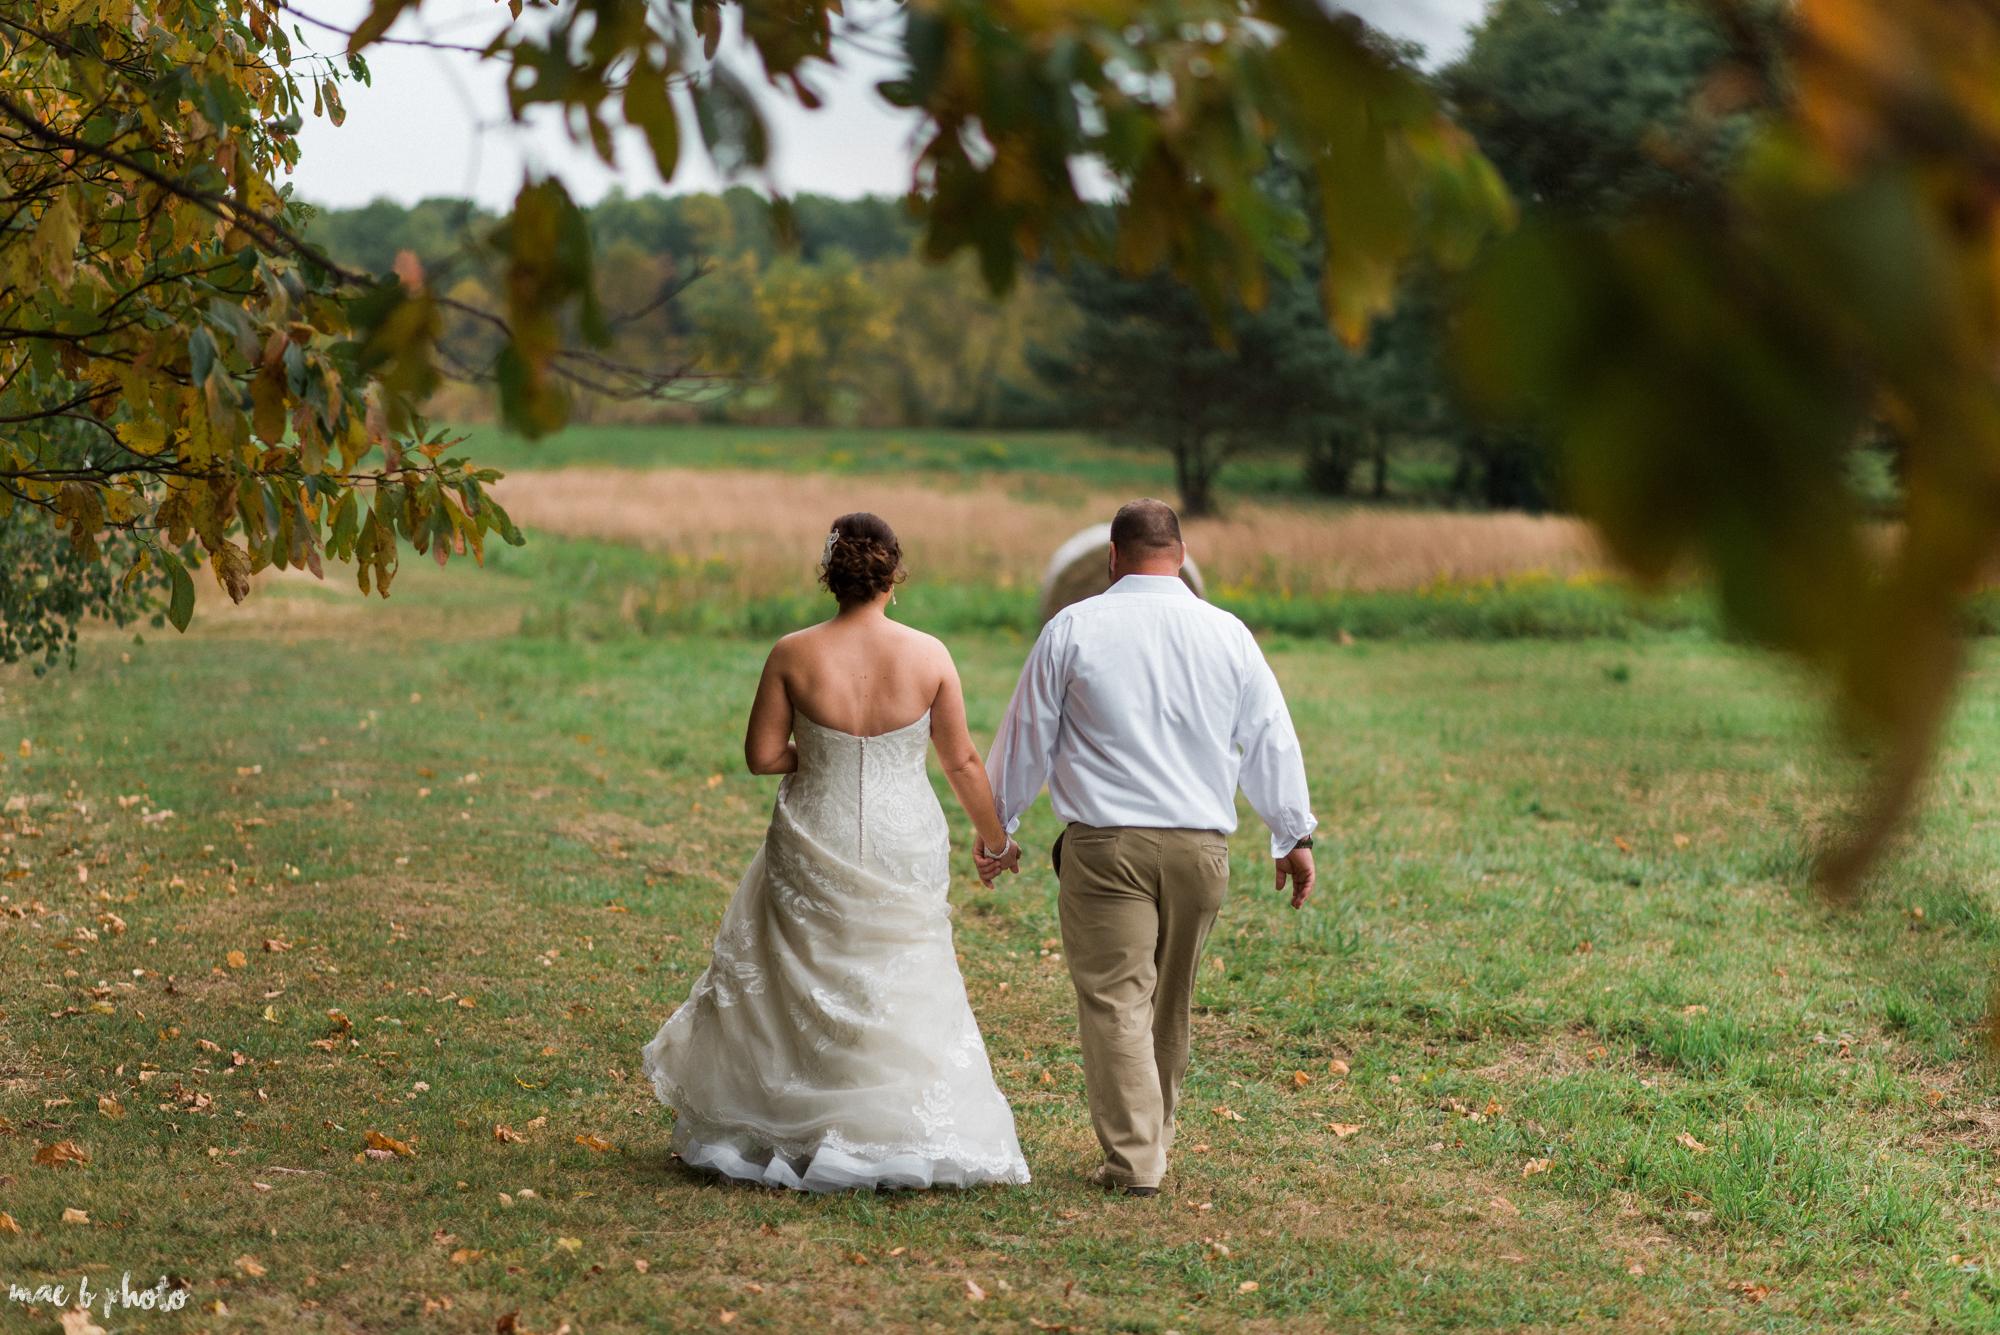 Sarah & Dustin's Rustic Chic Barn Wedding at Hartford Hill Winery in Hartford, Ohio by Mae B Photo-70.jpg